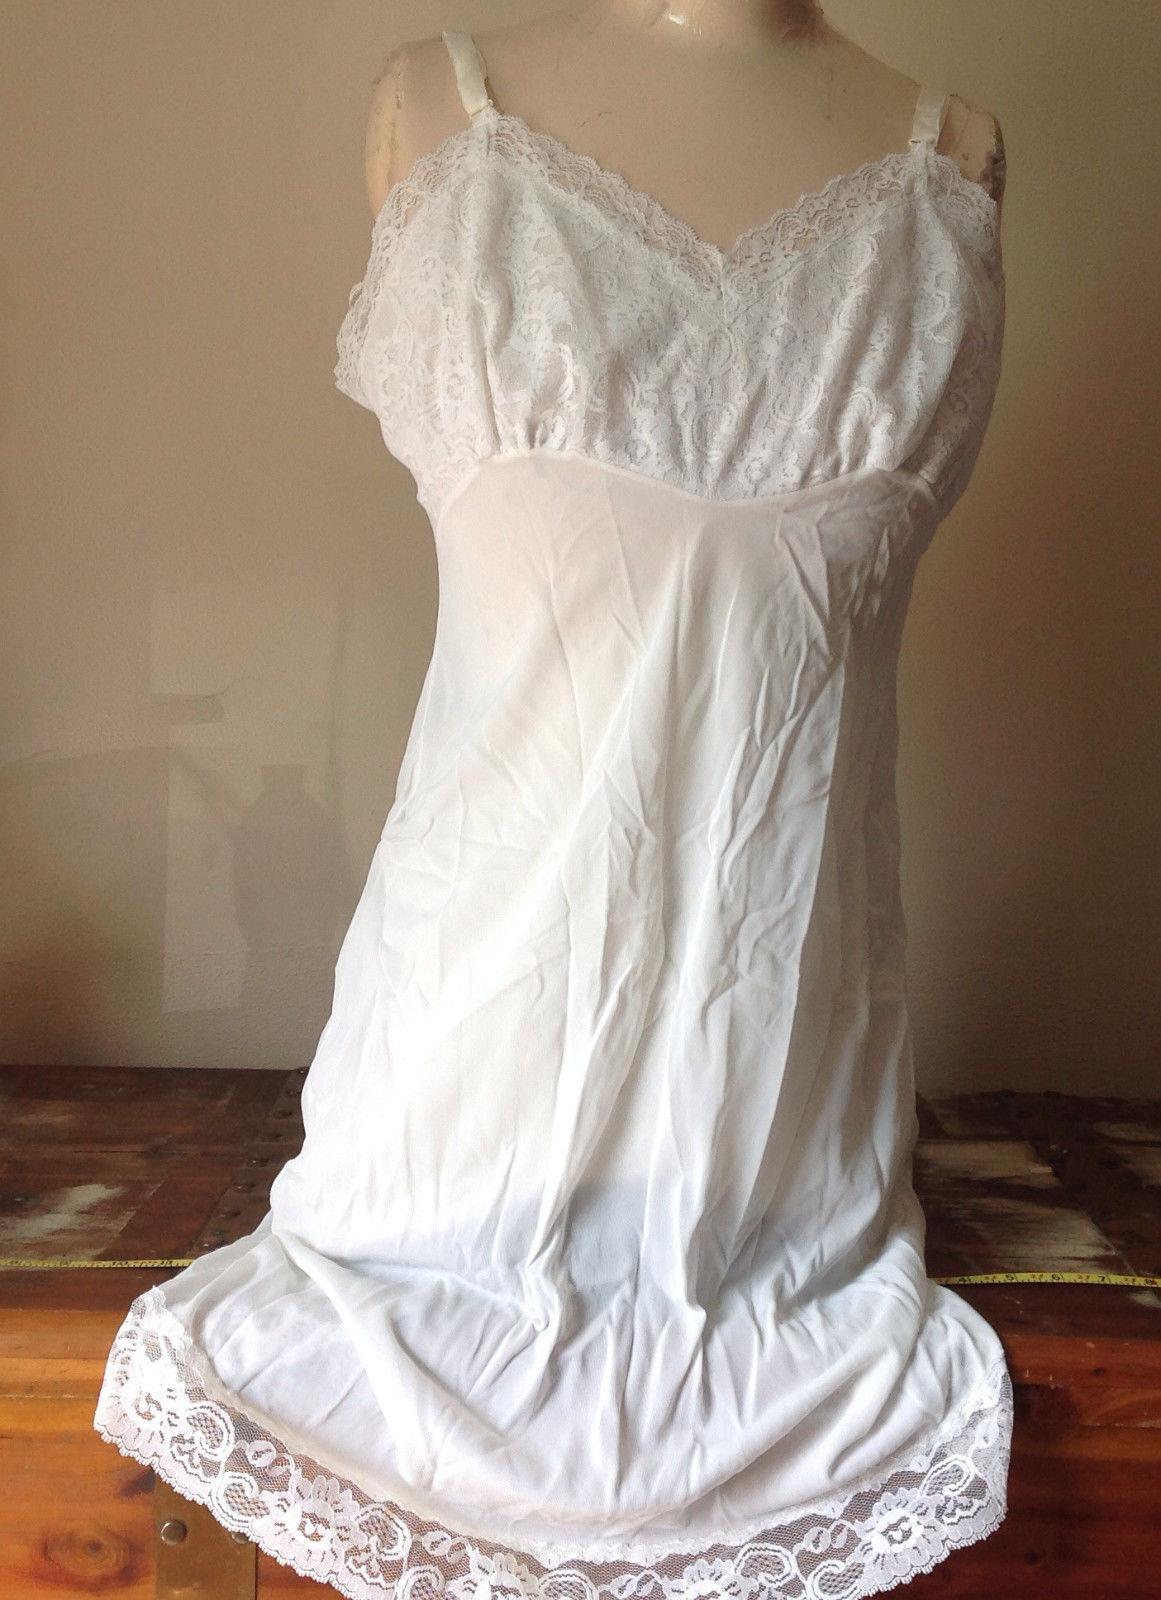 Pretty White Slip with Bottom and Top Design 100 Percent Nylon Size 38